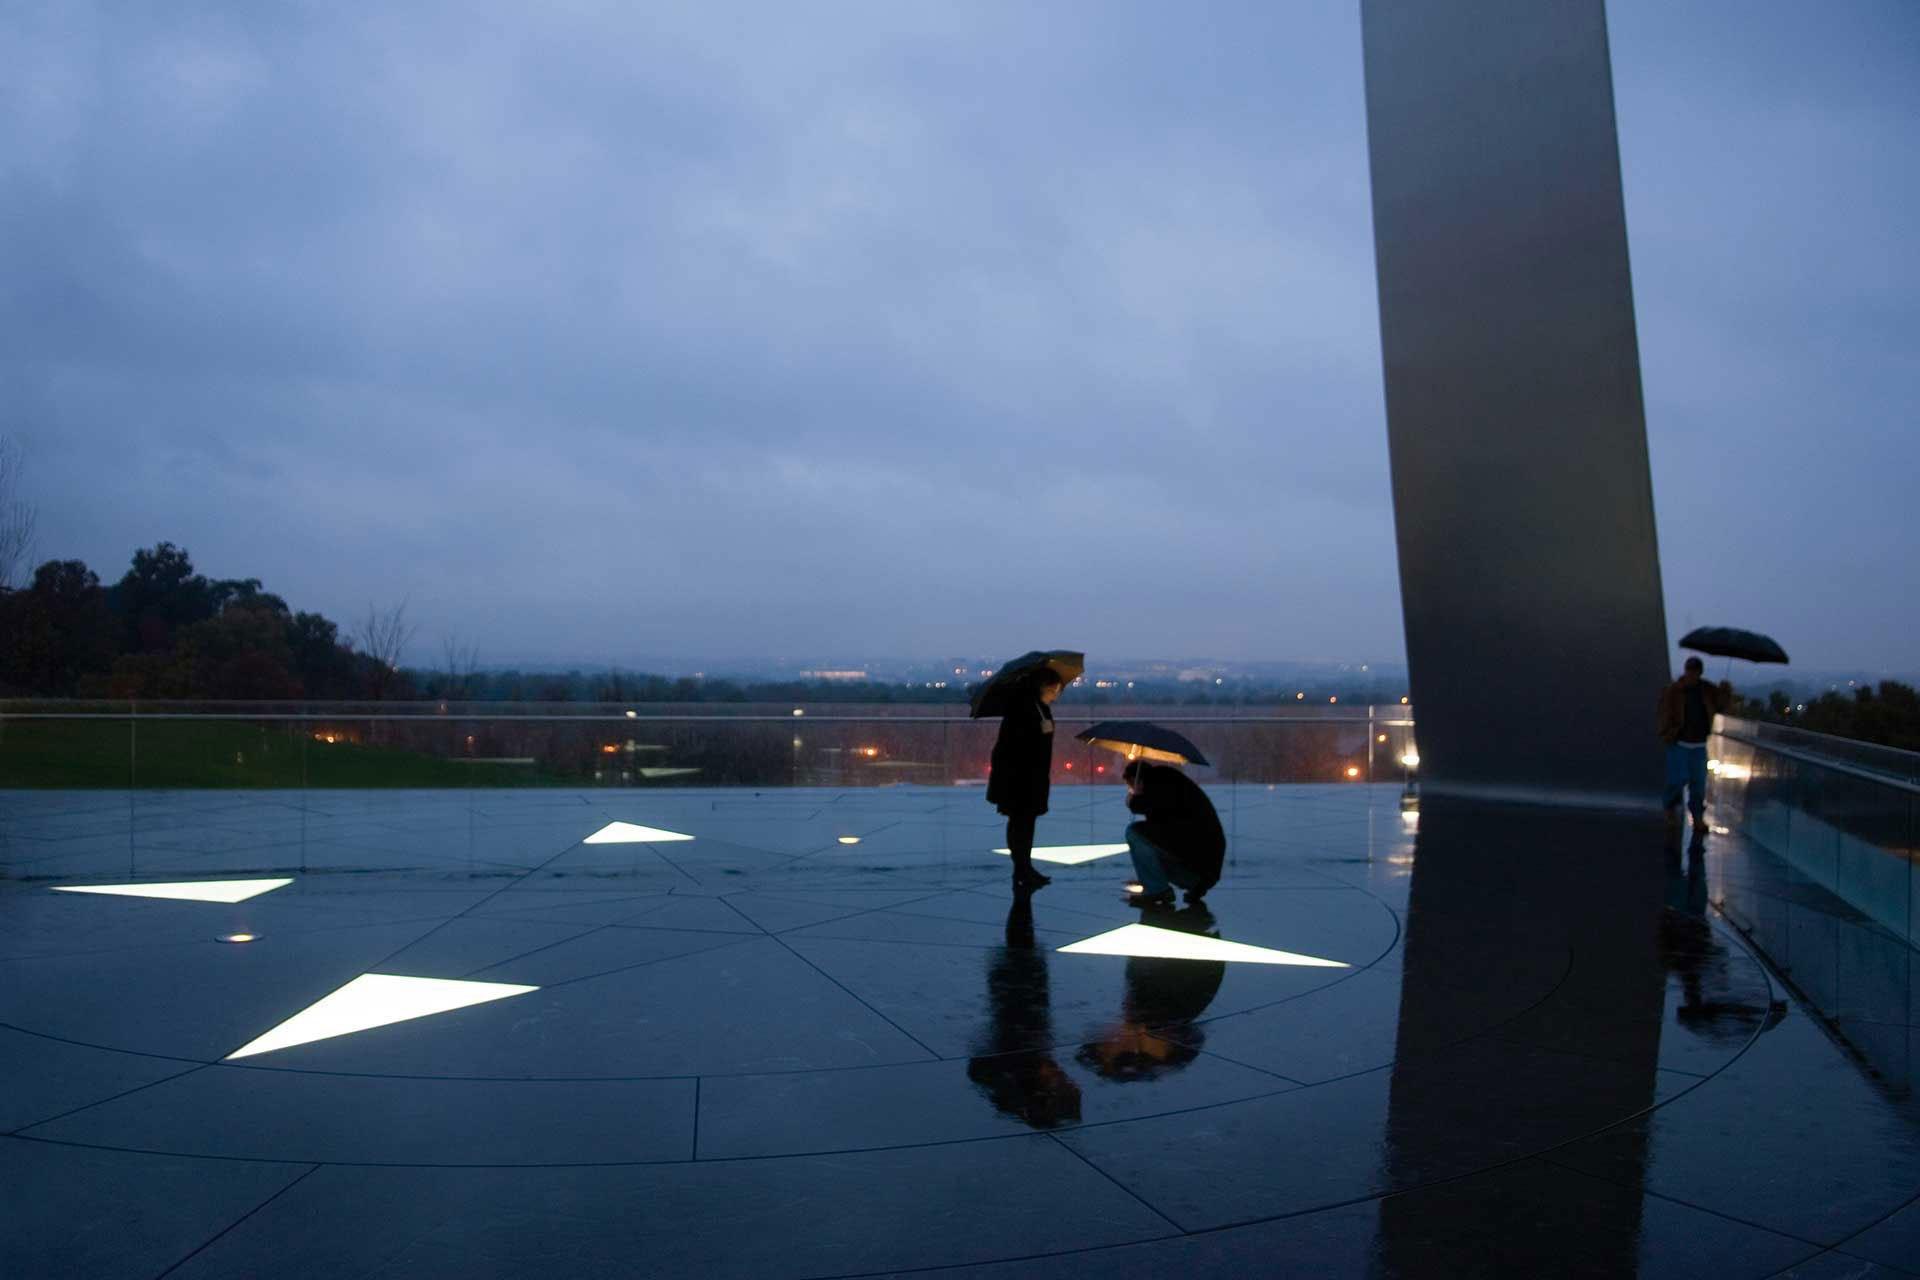 Air Force Memorial rainy night